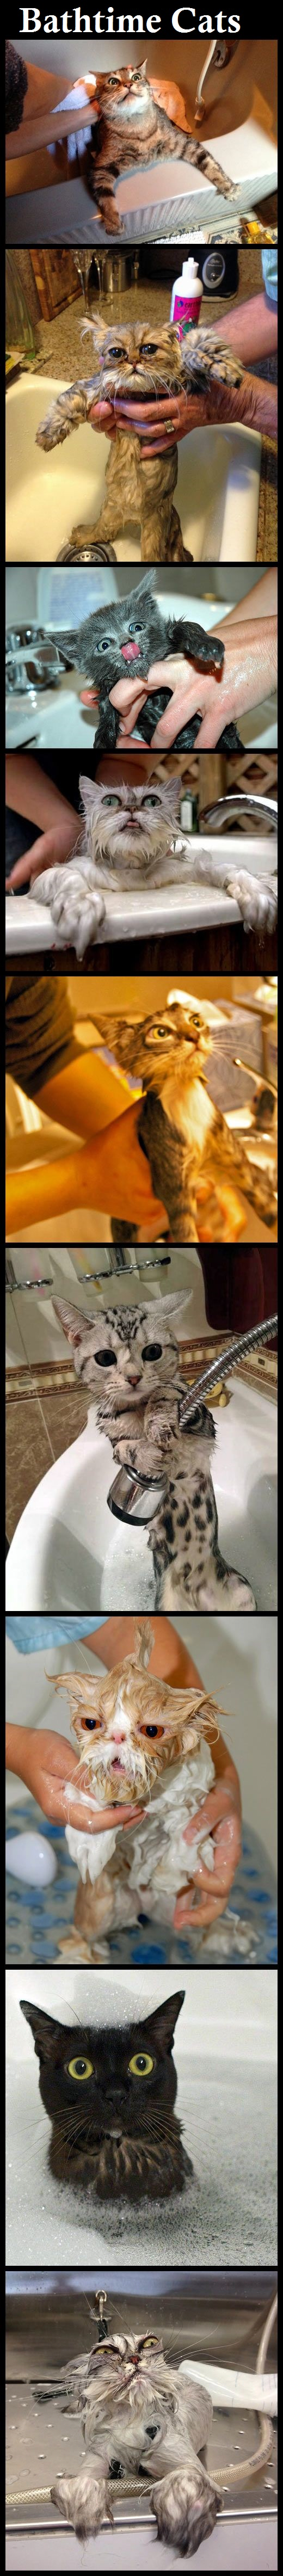 Funny Unhappy Bathtime Cats Cute Animals Animals Funny Cats Funny Animals